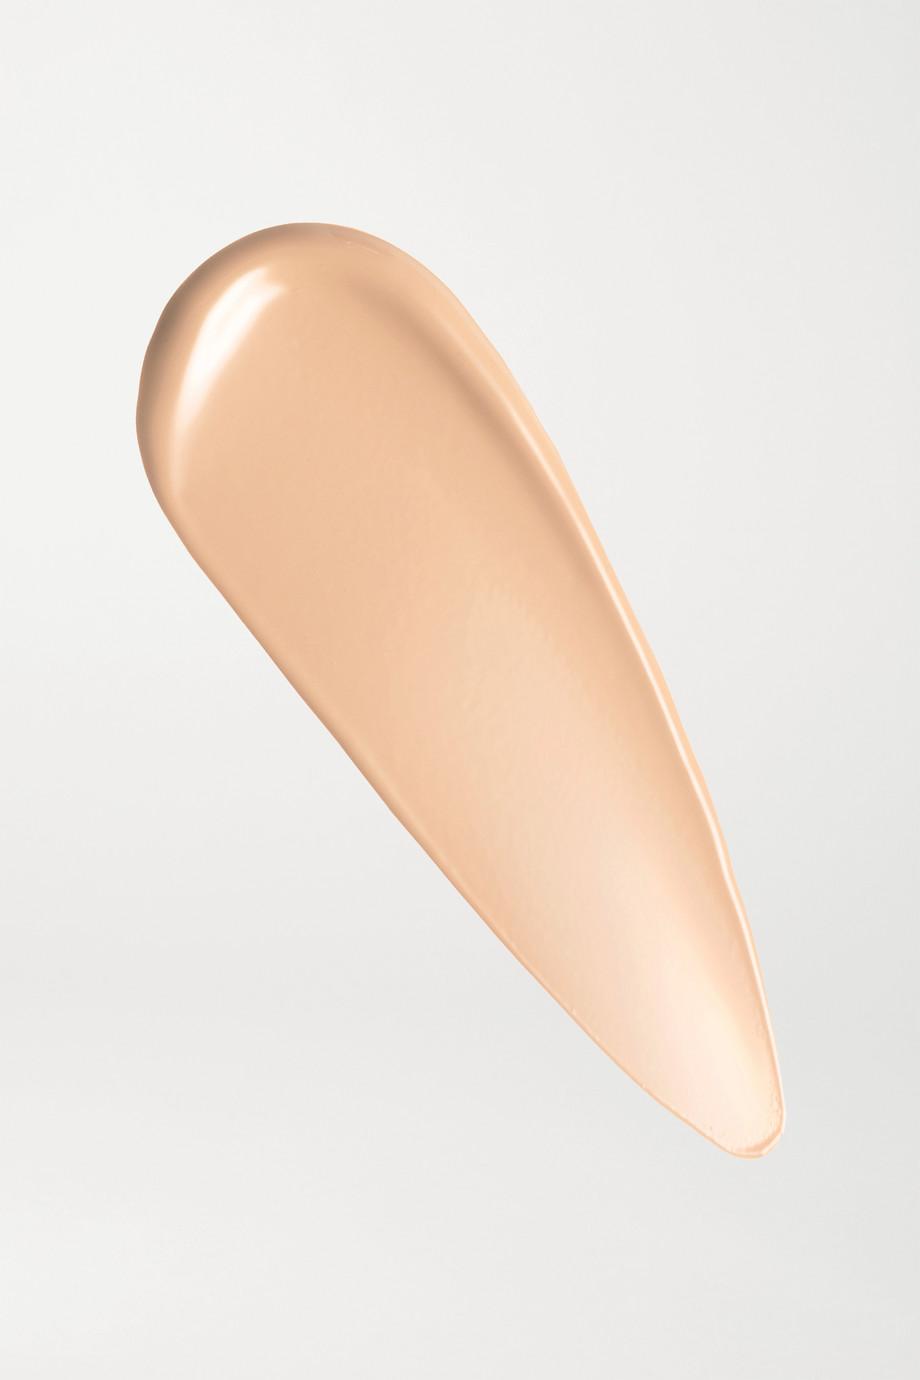 Kevyn Aucoin Stripped Nude Skin Tint - Light 03, 30ml